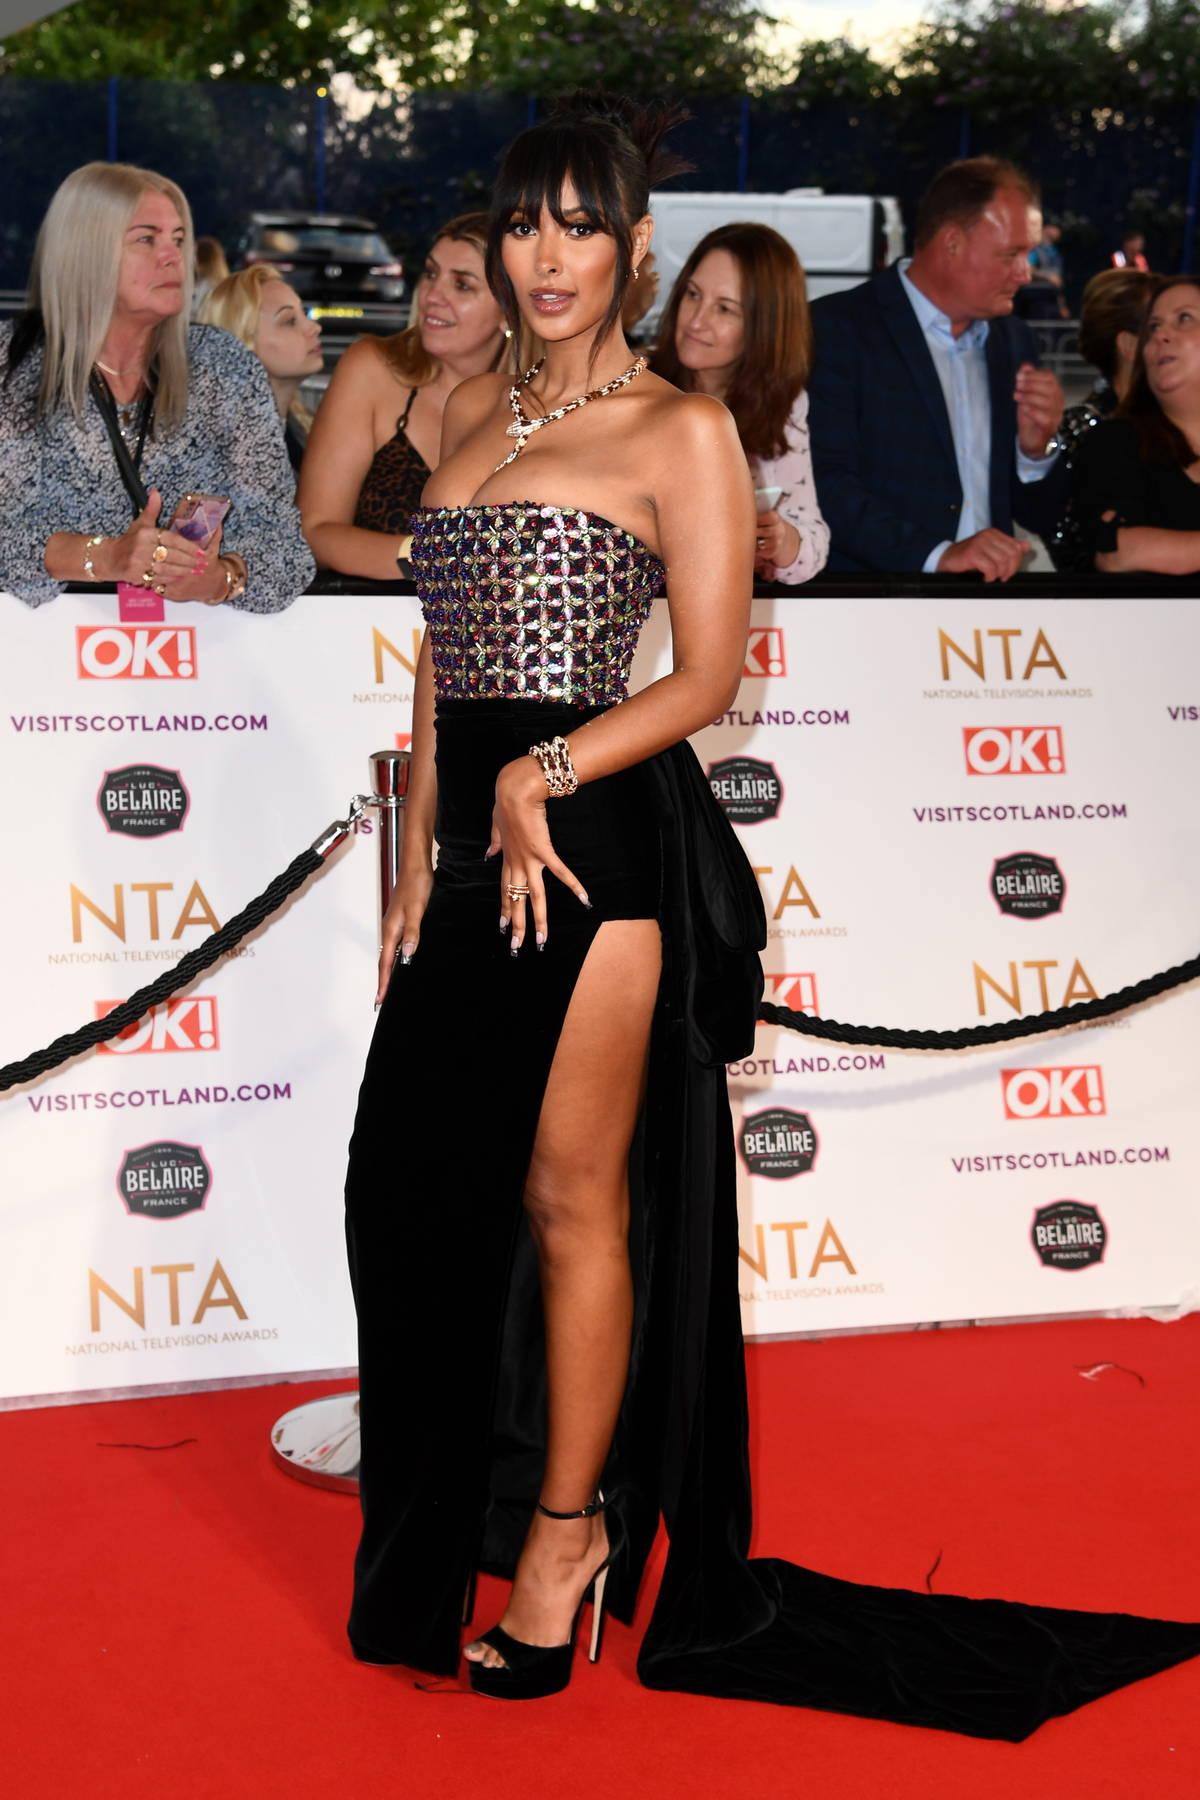 Maya Jama attends the 2021 National Television Awards at The O2 Arena in London, UK